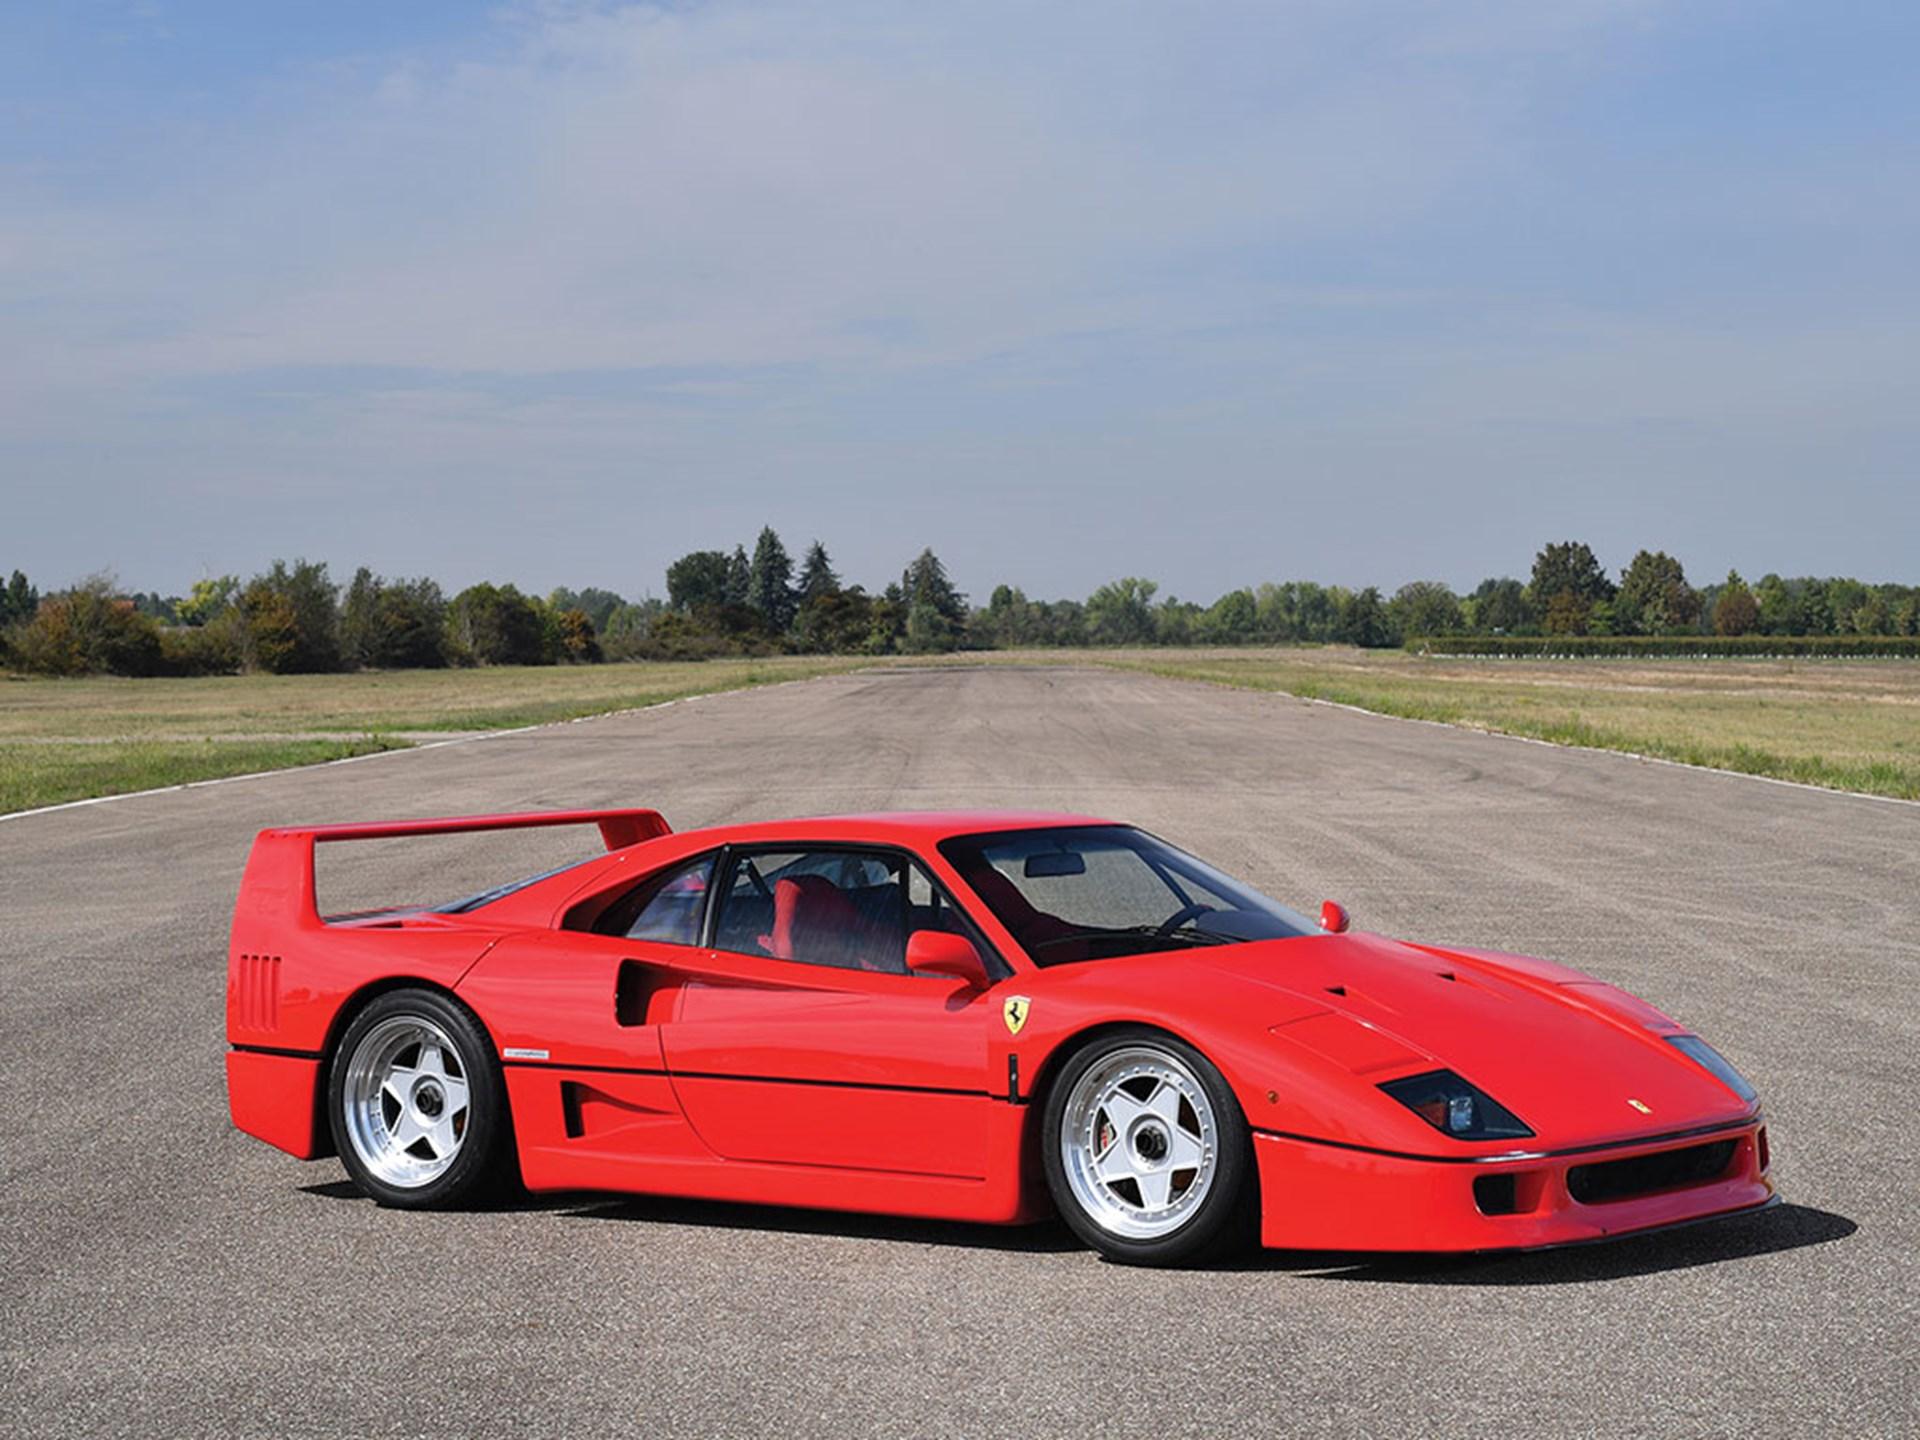 RM Sotheby's - 1992 Ferrari F40 | Duemila Ruote 2016